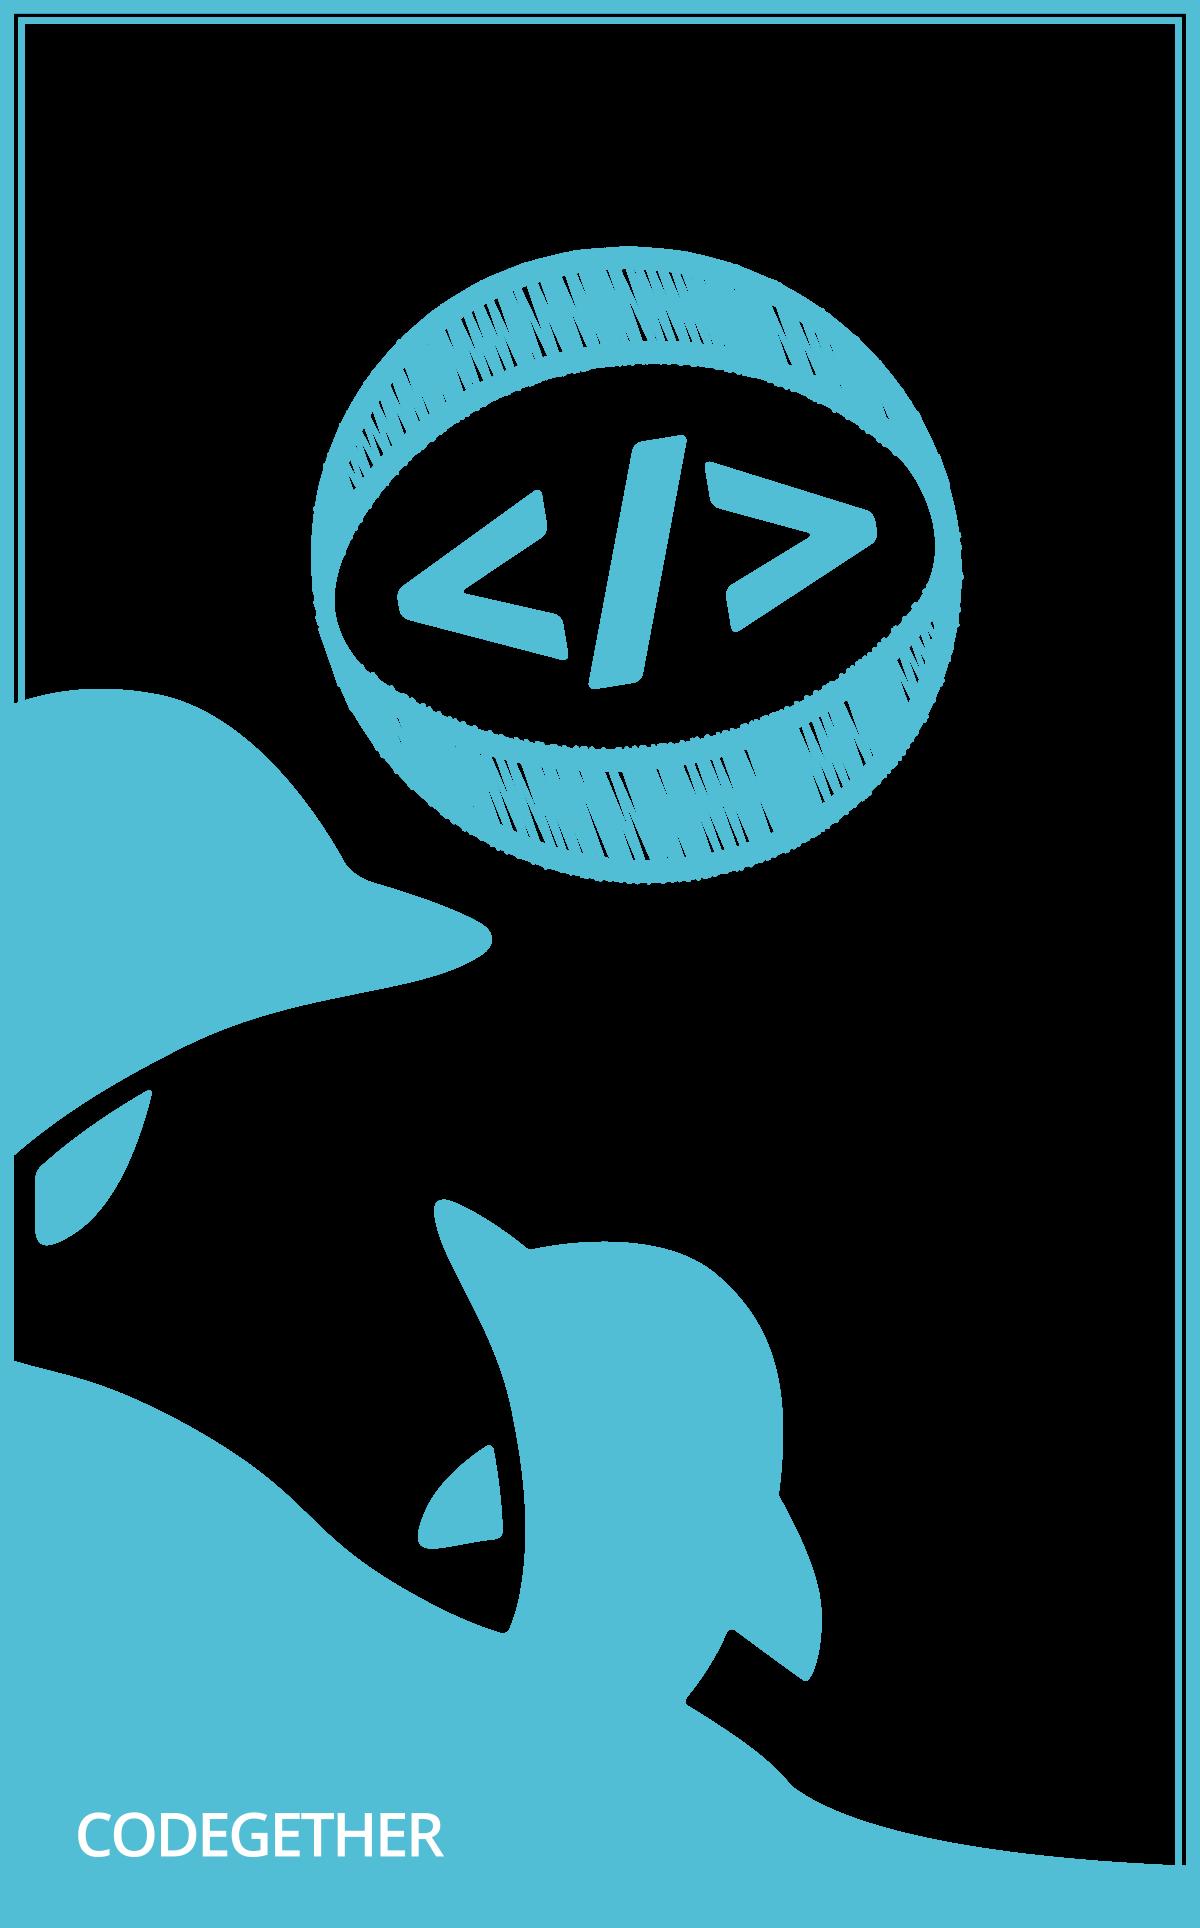 Business card, letterhead, and t-shirt design